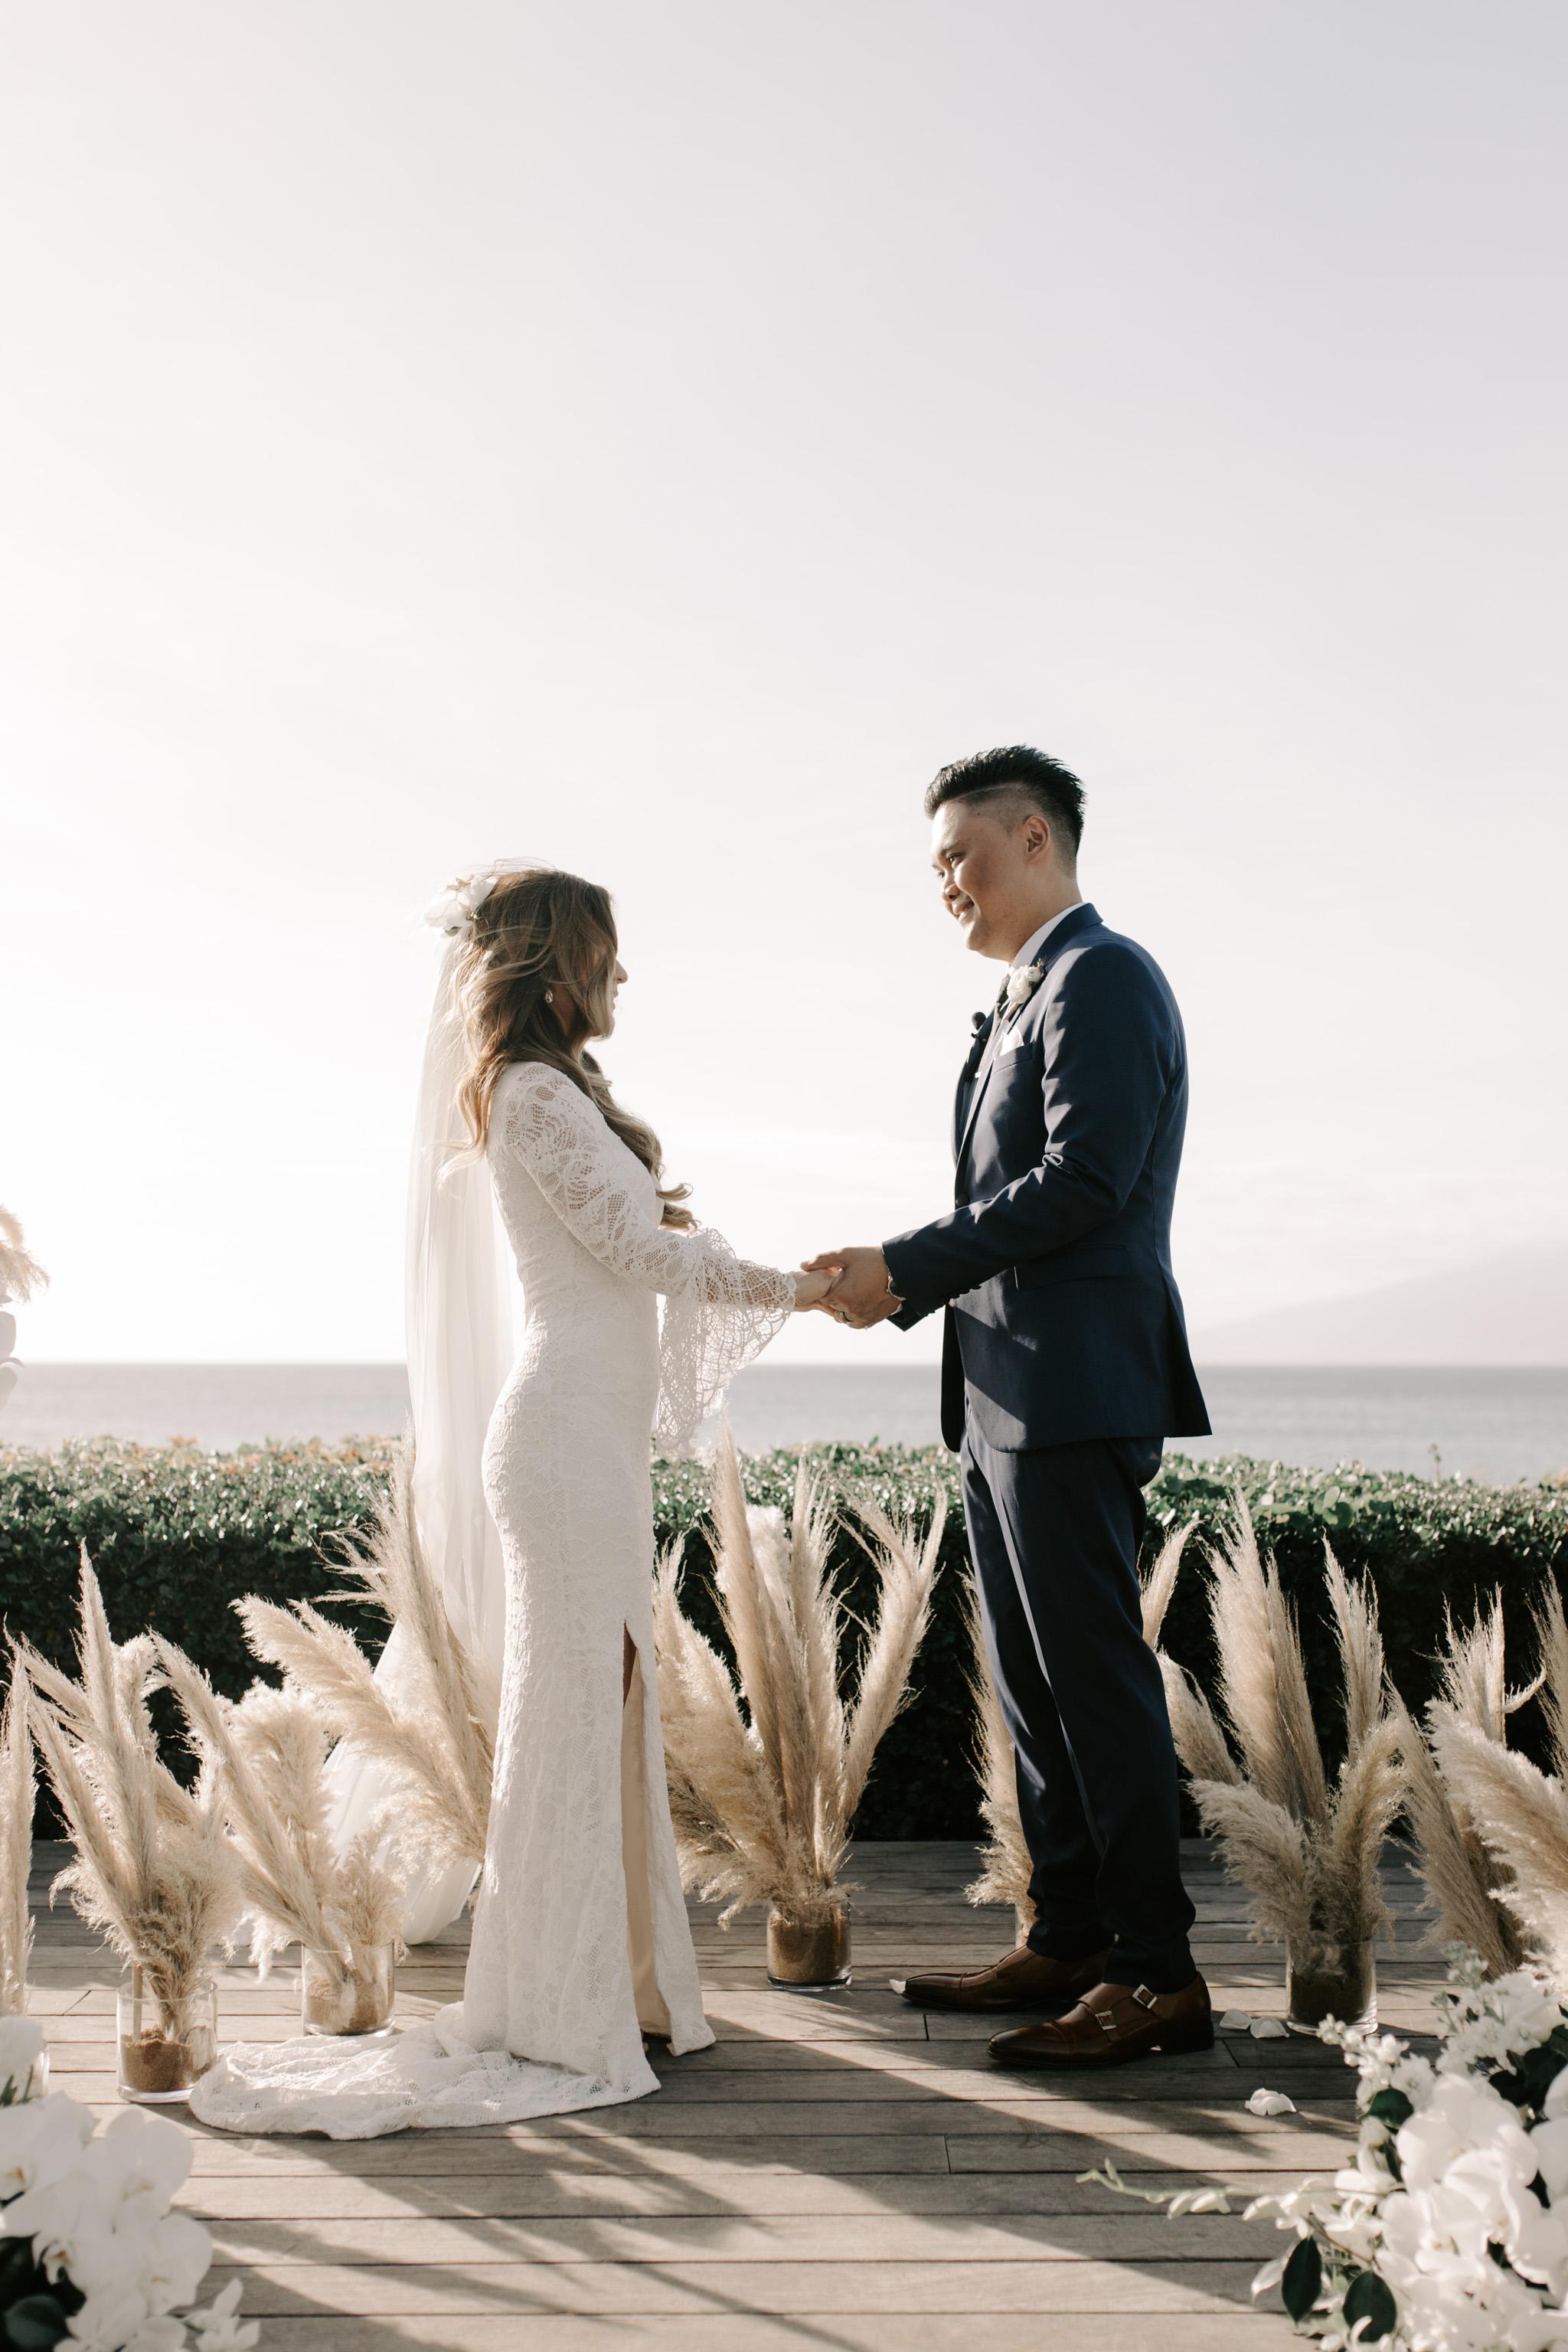 Merriman's Kapalua Maui wedding by Hawaii wedding photographer Desiree Leilani